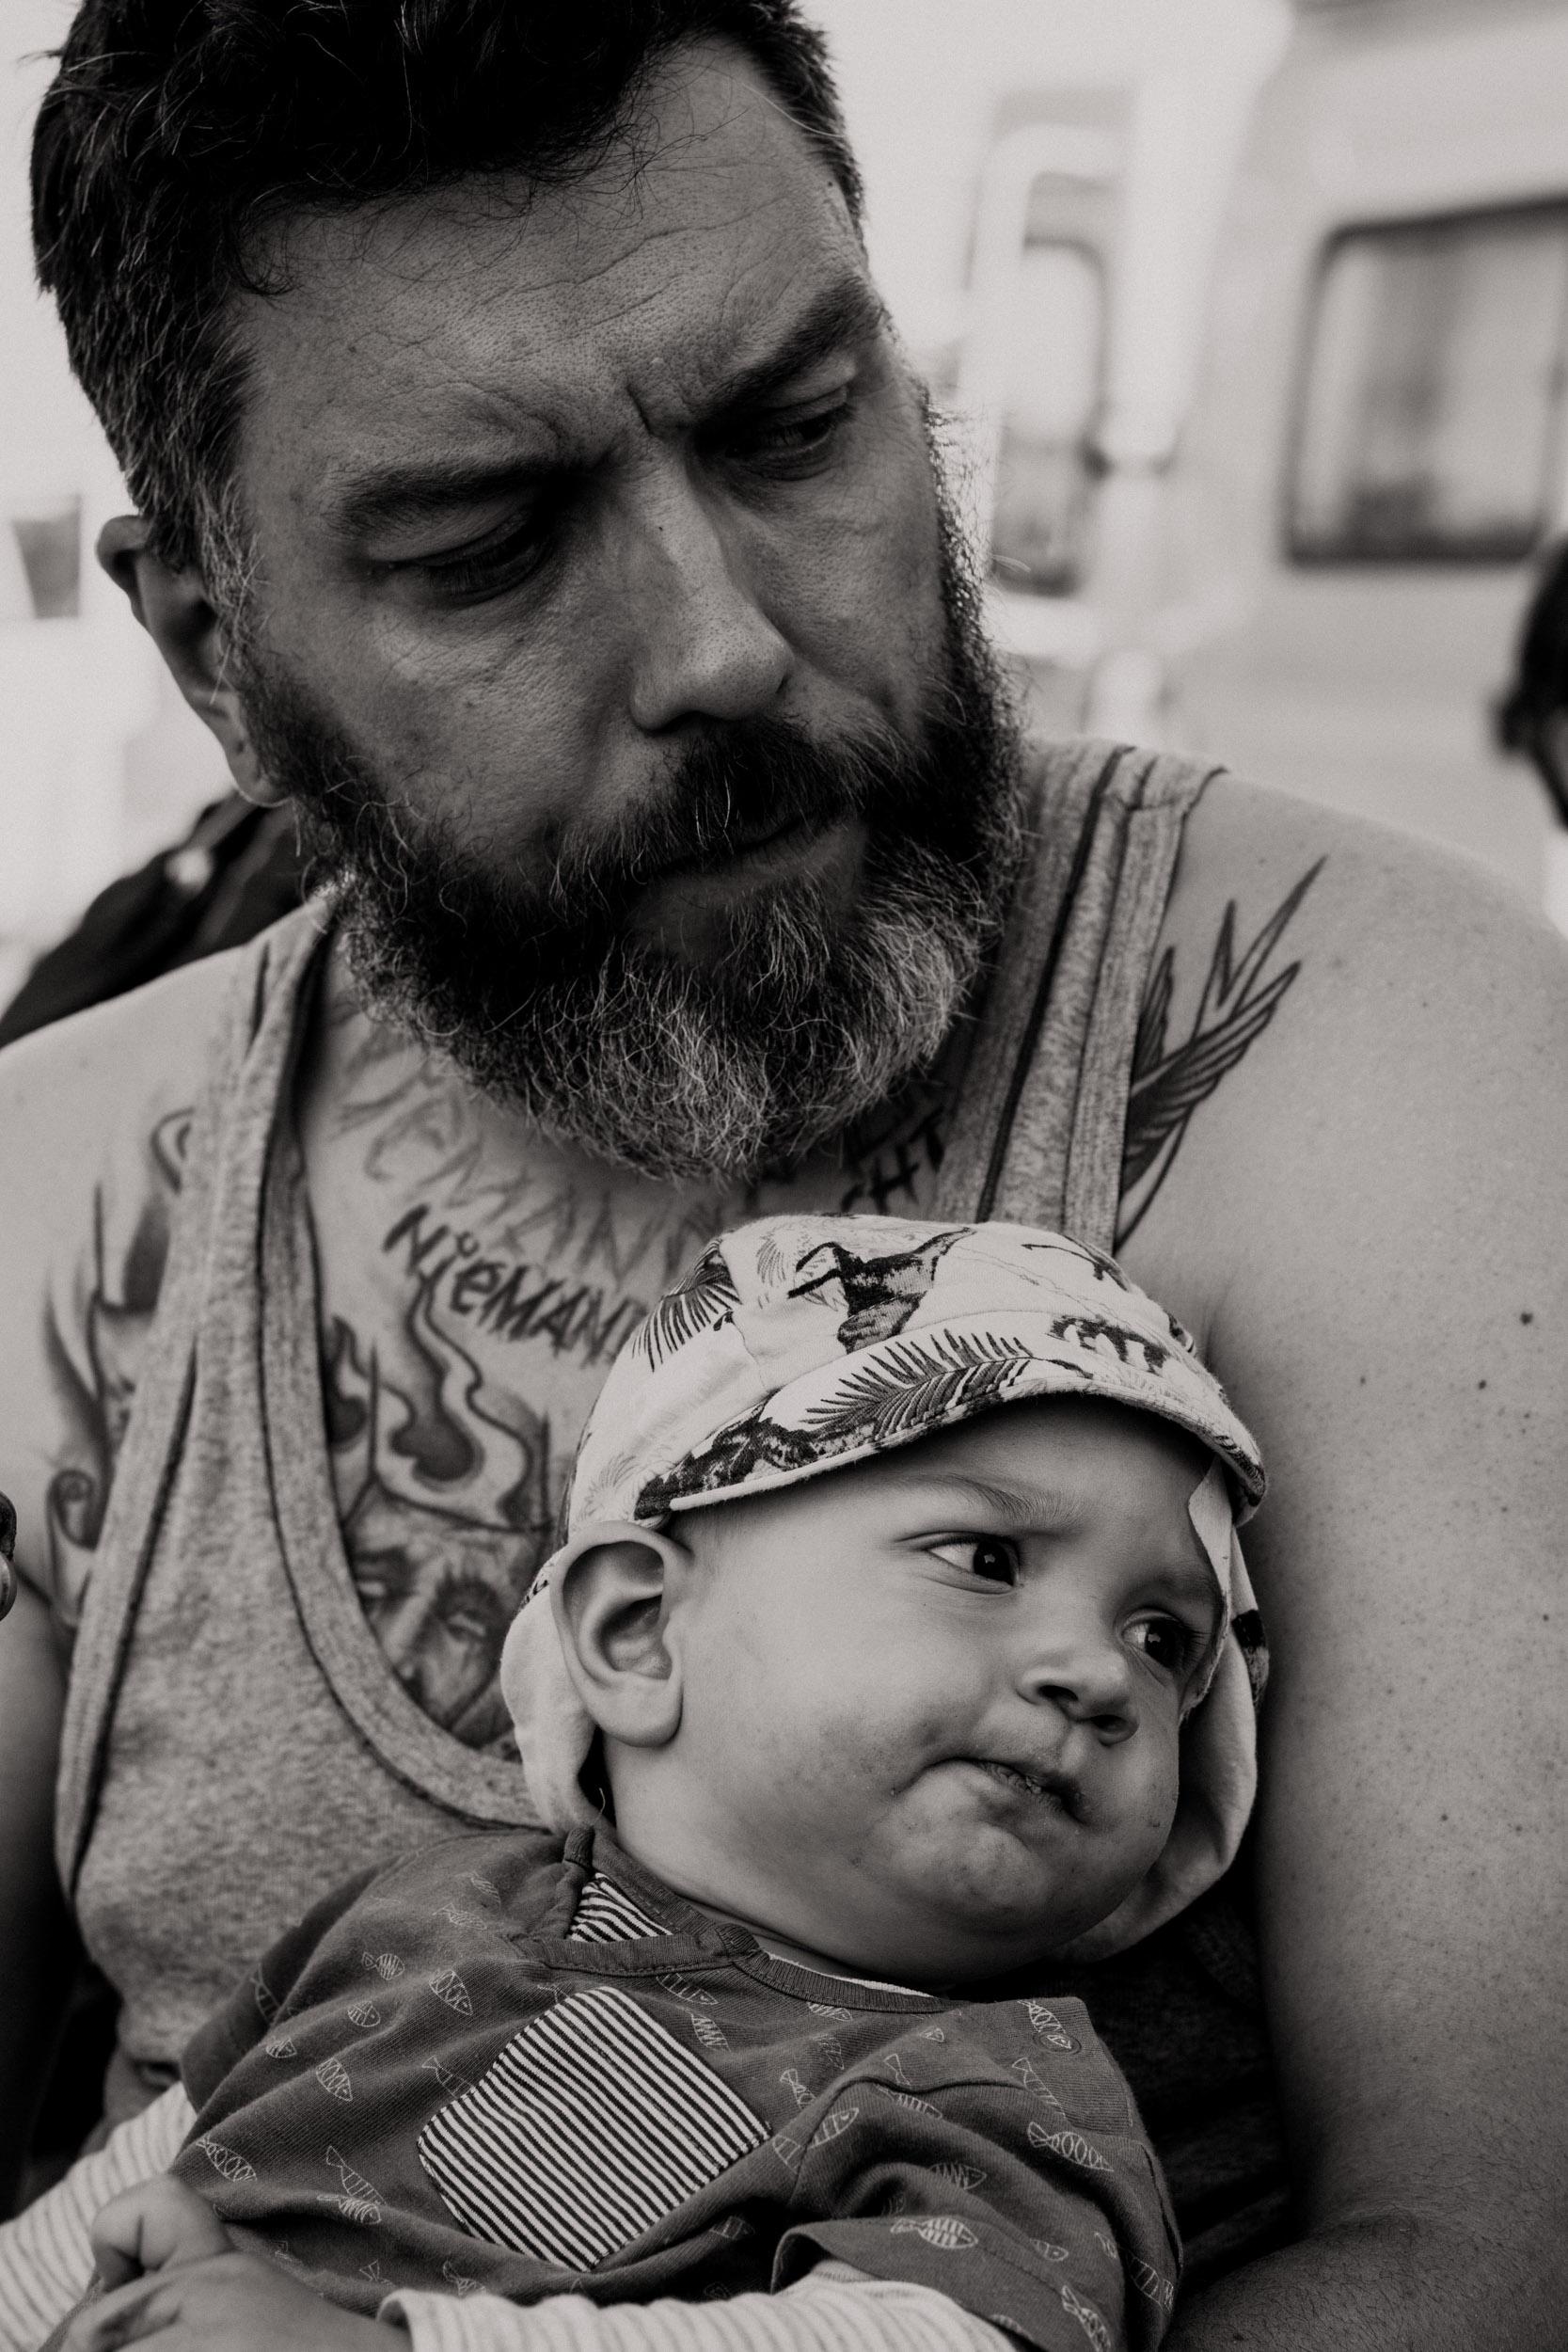 nora kuhn fotografie familienfotografie dokumentarische fotografie slider 1